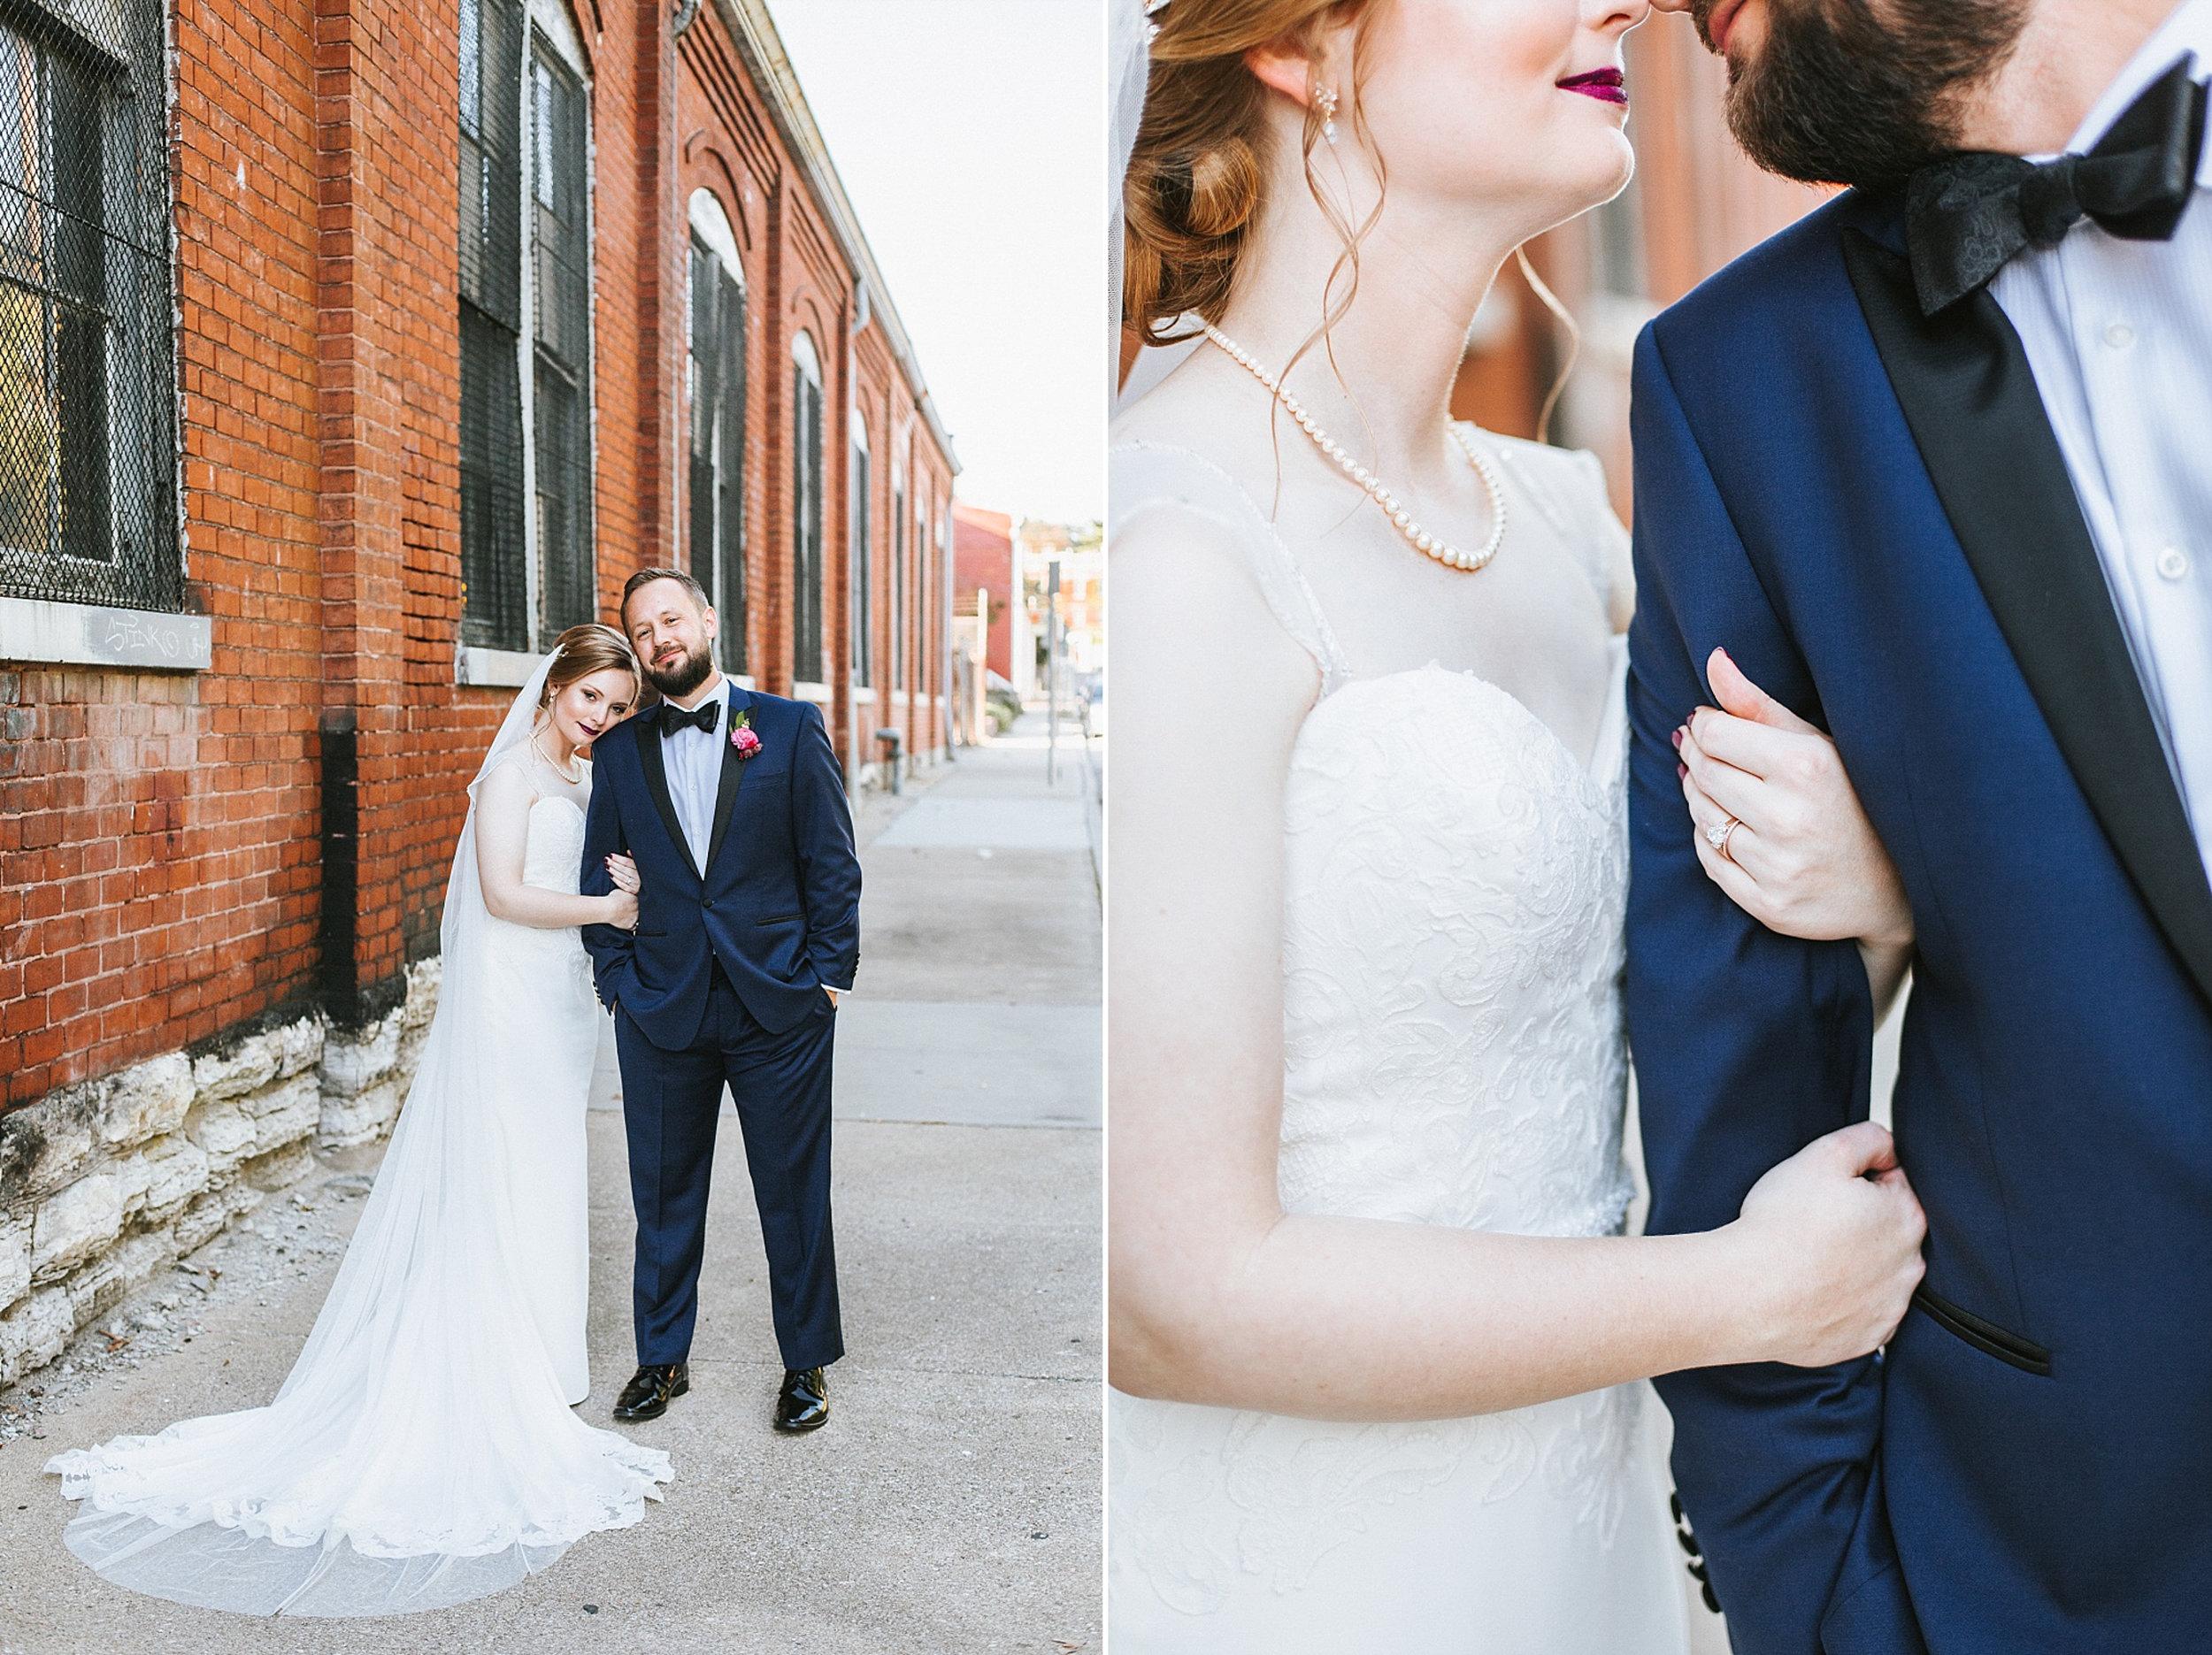 Brooke Townsend Photography - Ohio Wedding Photographer-168.jpg